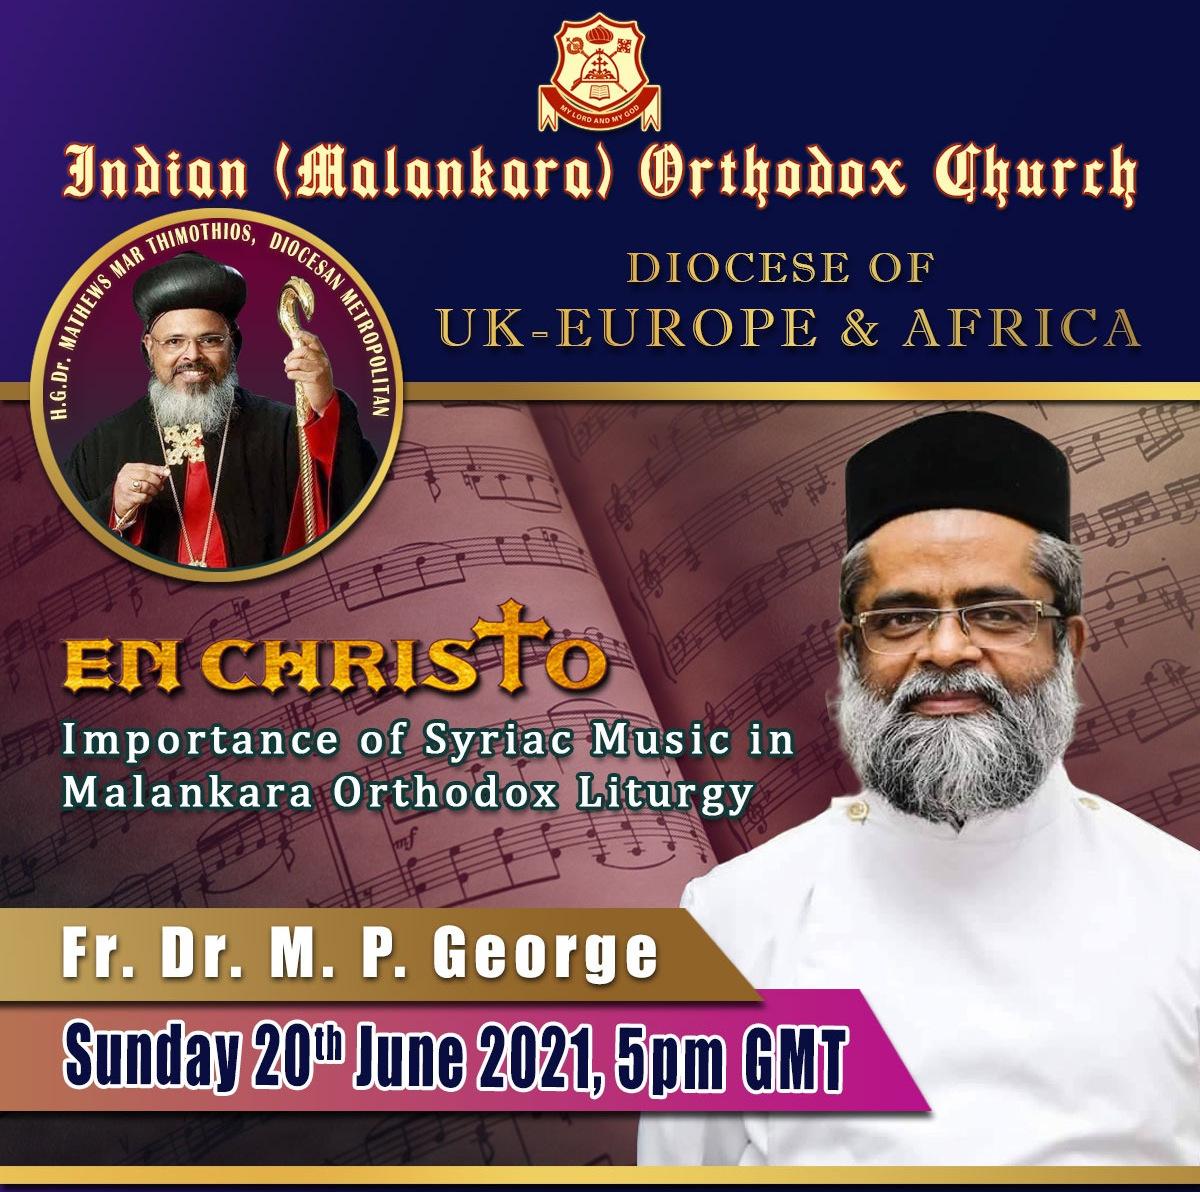 EnChristo Learning Series - Importance of Syriac Music in Malankara Orthodox Liturgy